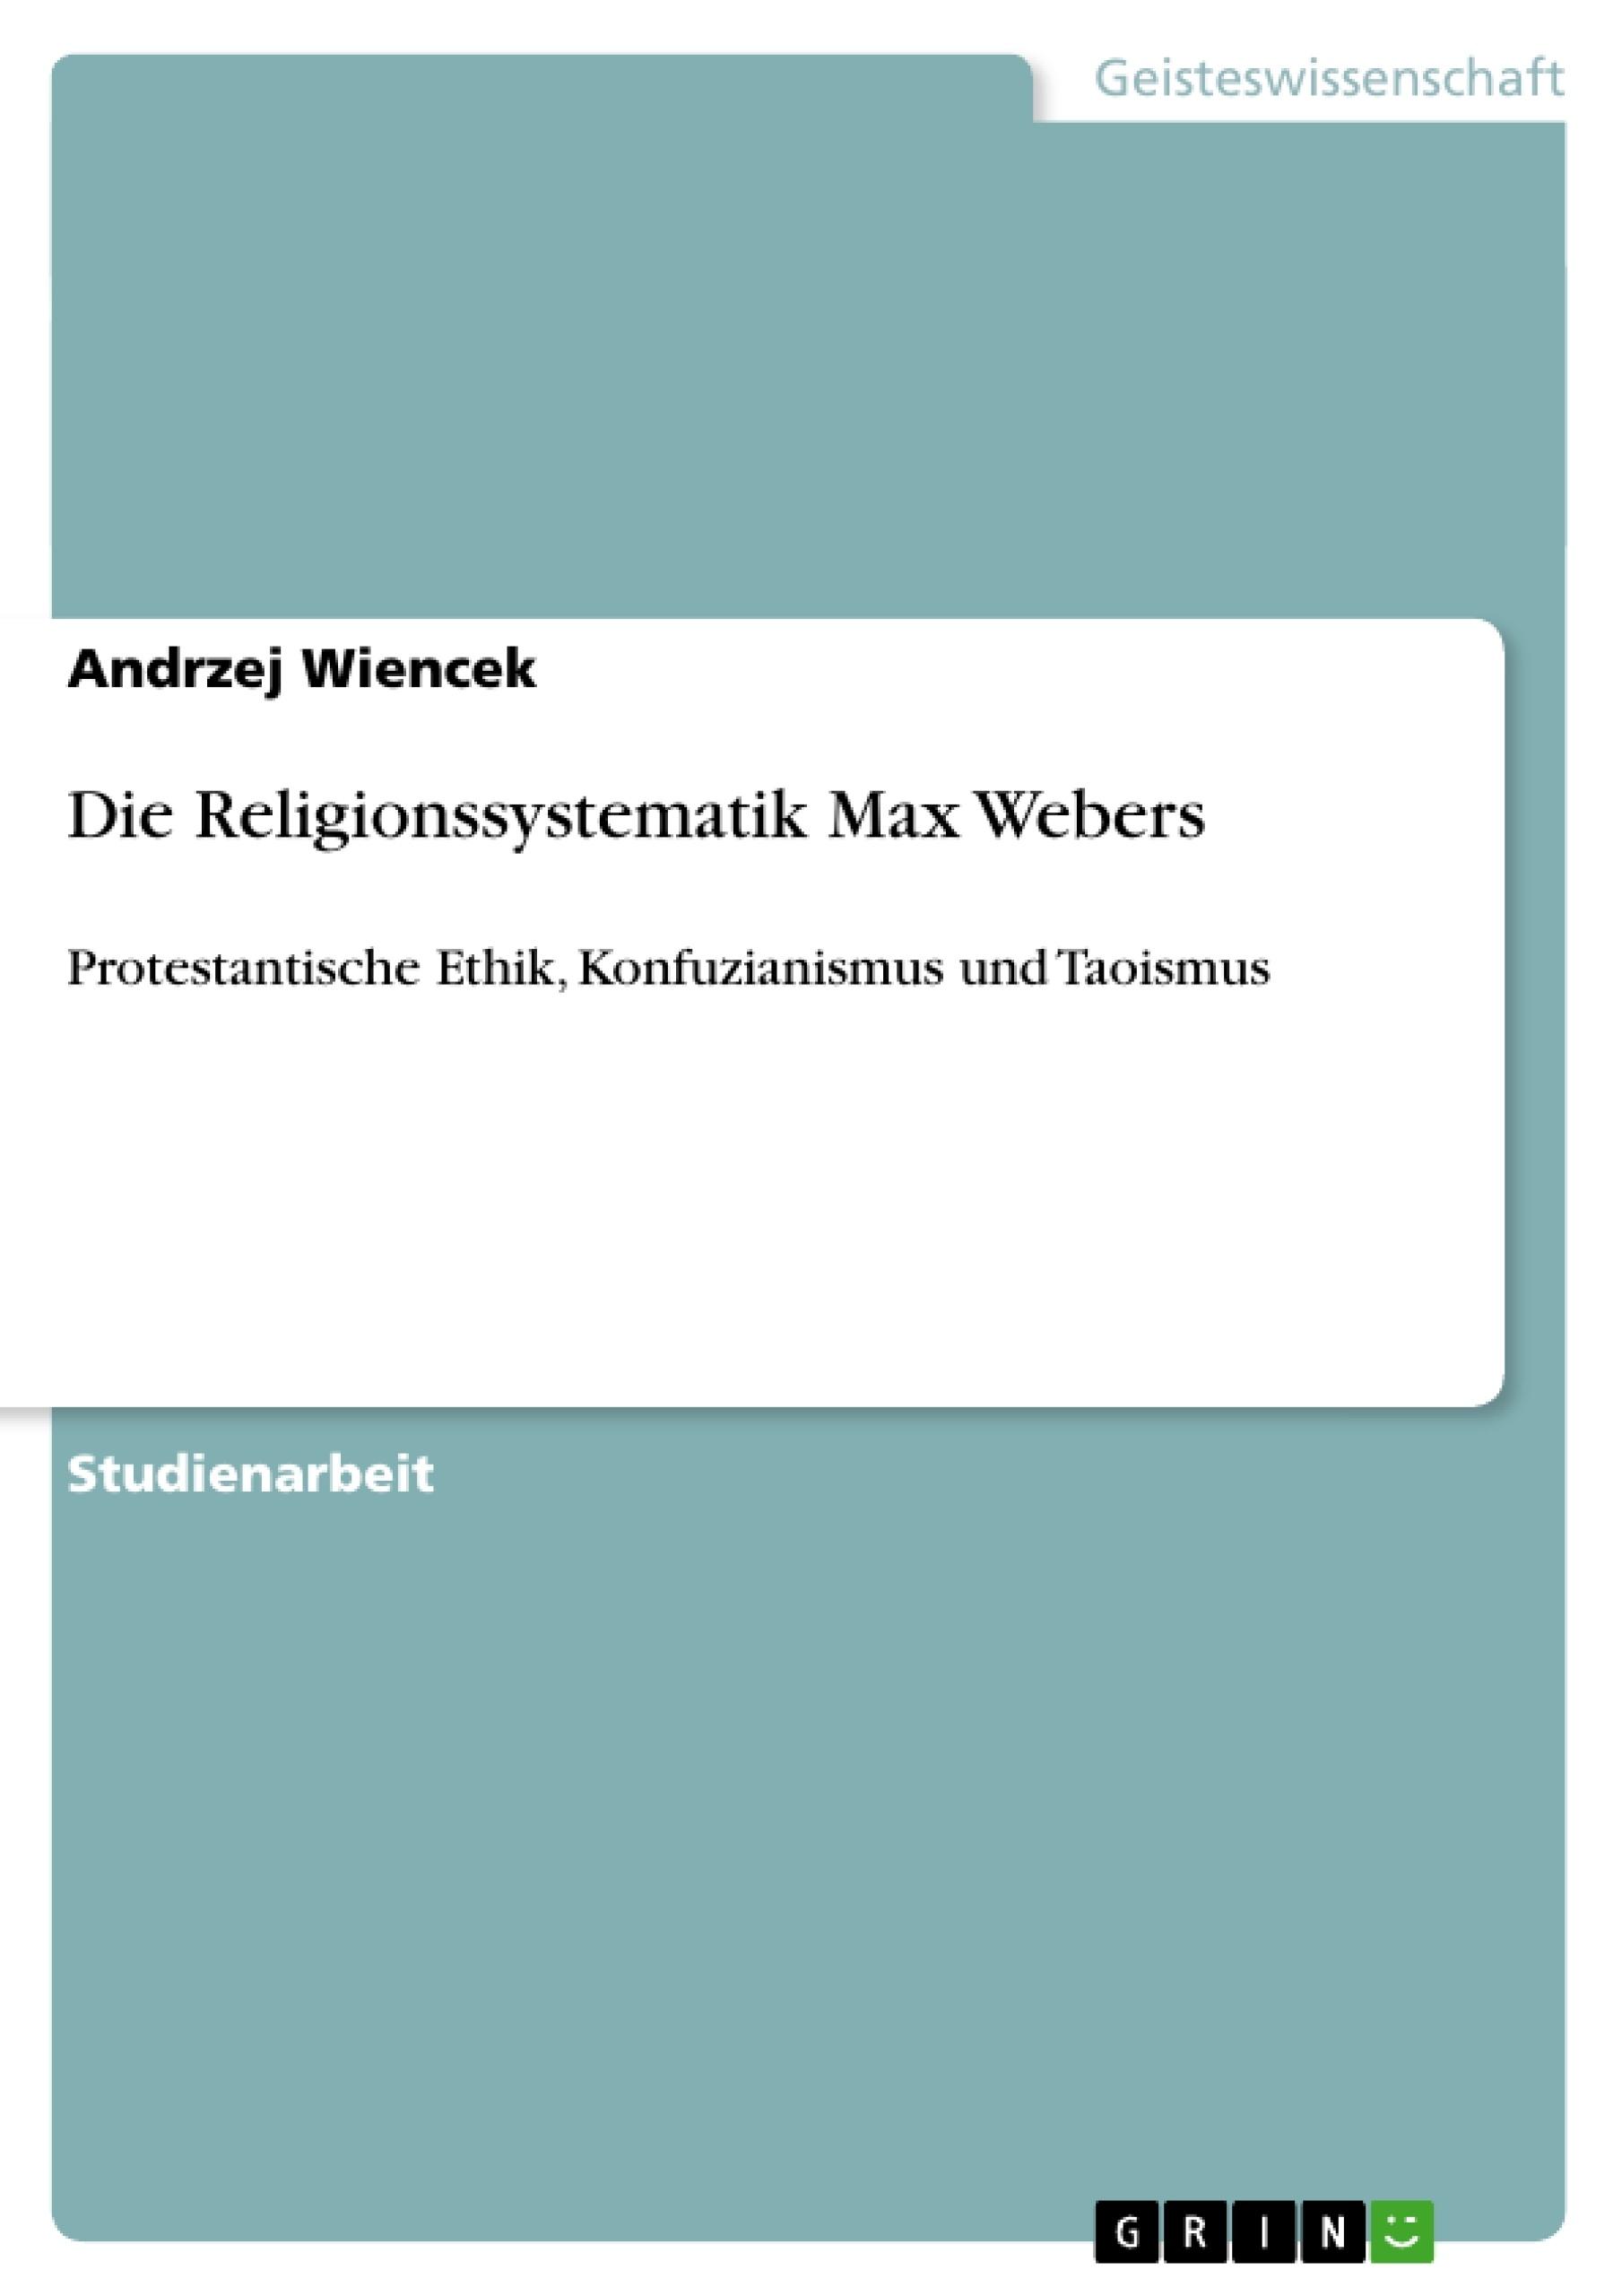 Titel: Die Religionssystematik Max Webers